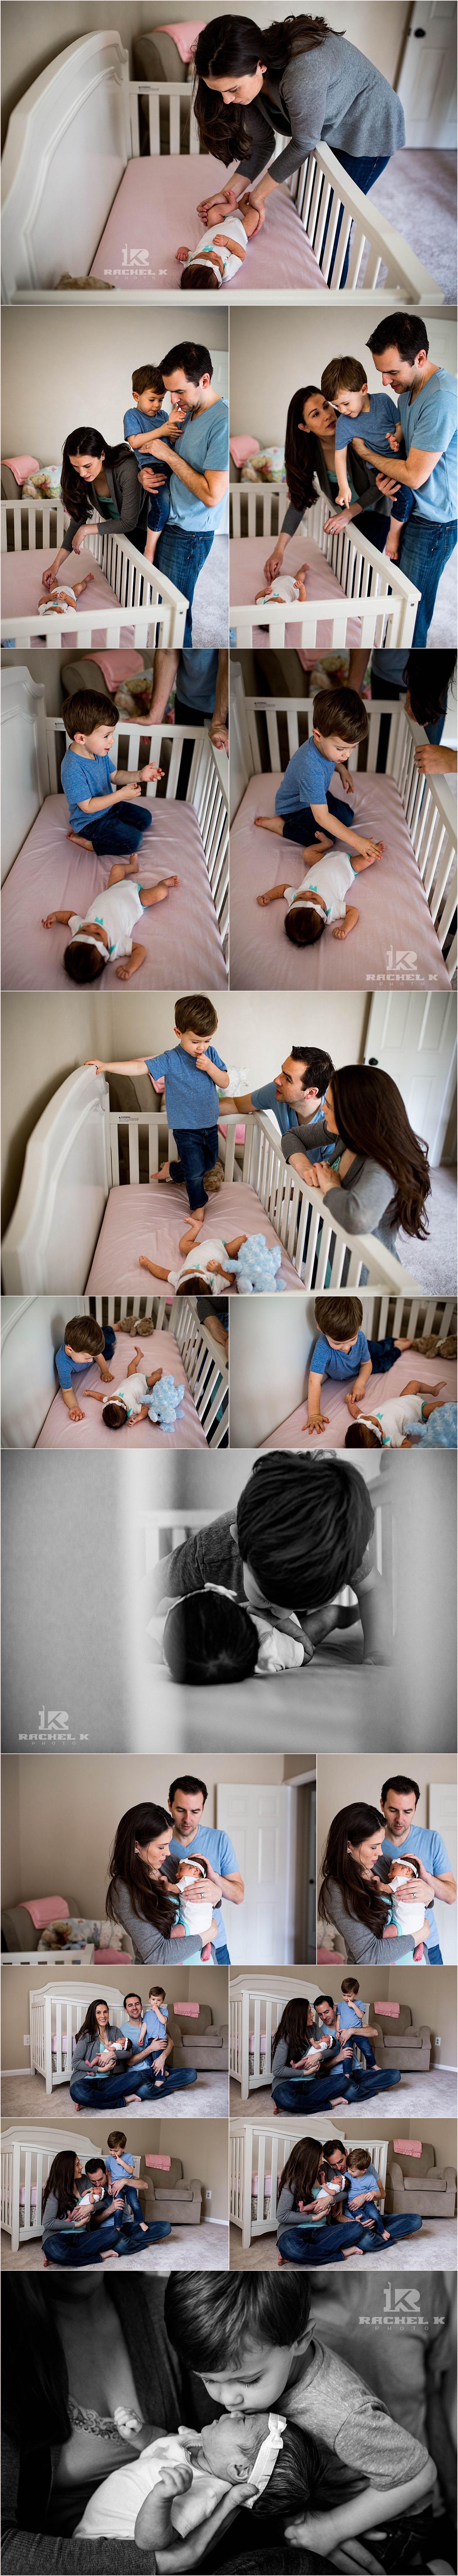 Fairfax Va newborn lifestyle photos by Rachel K Photo